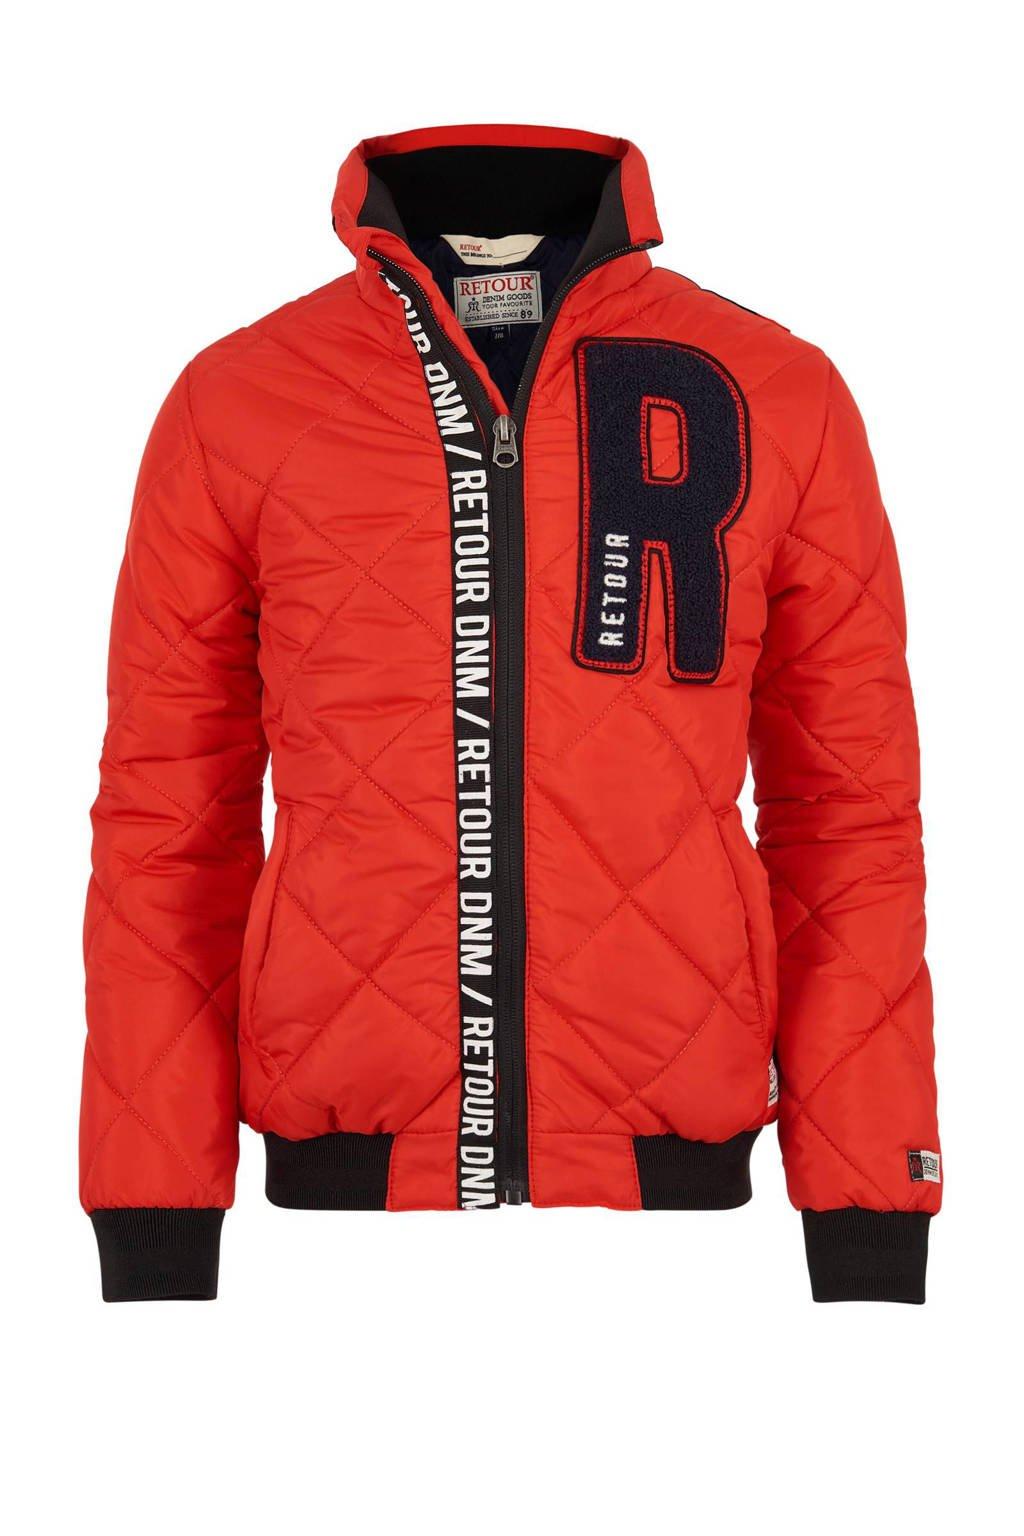 Retour Denim winterjas Dean rood, Rood/zwart